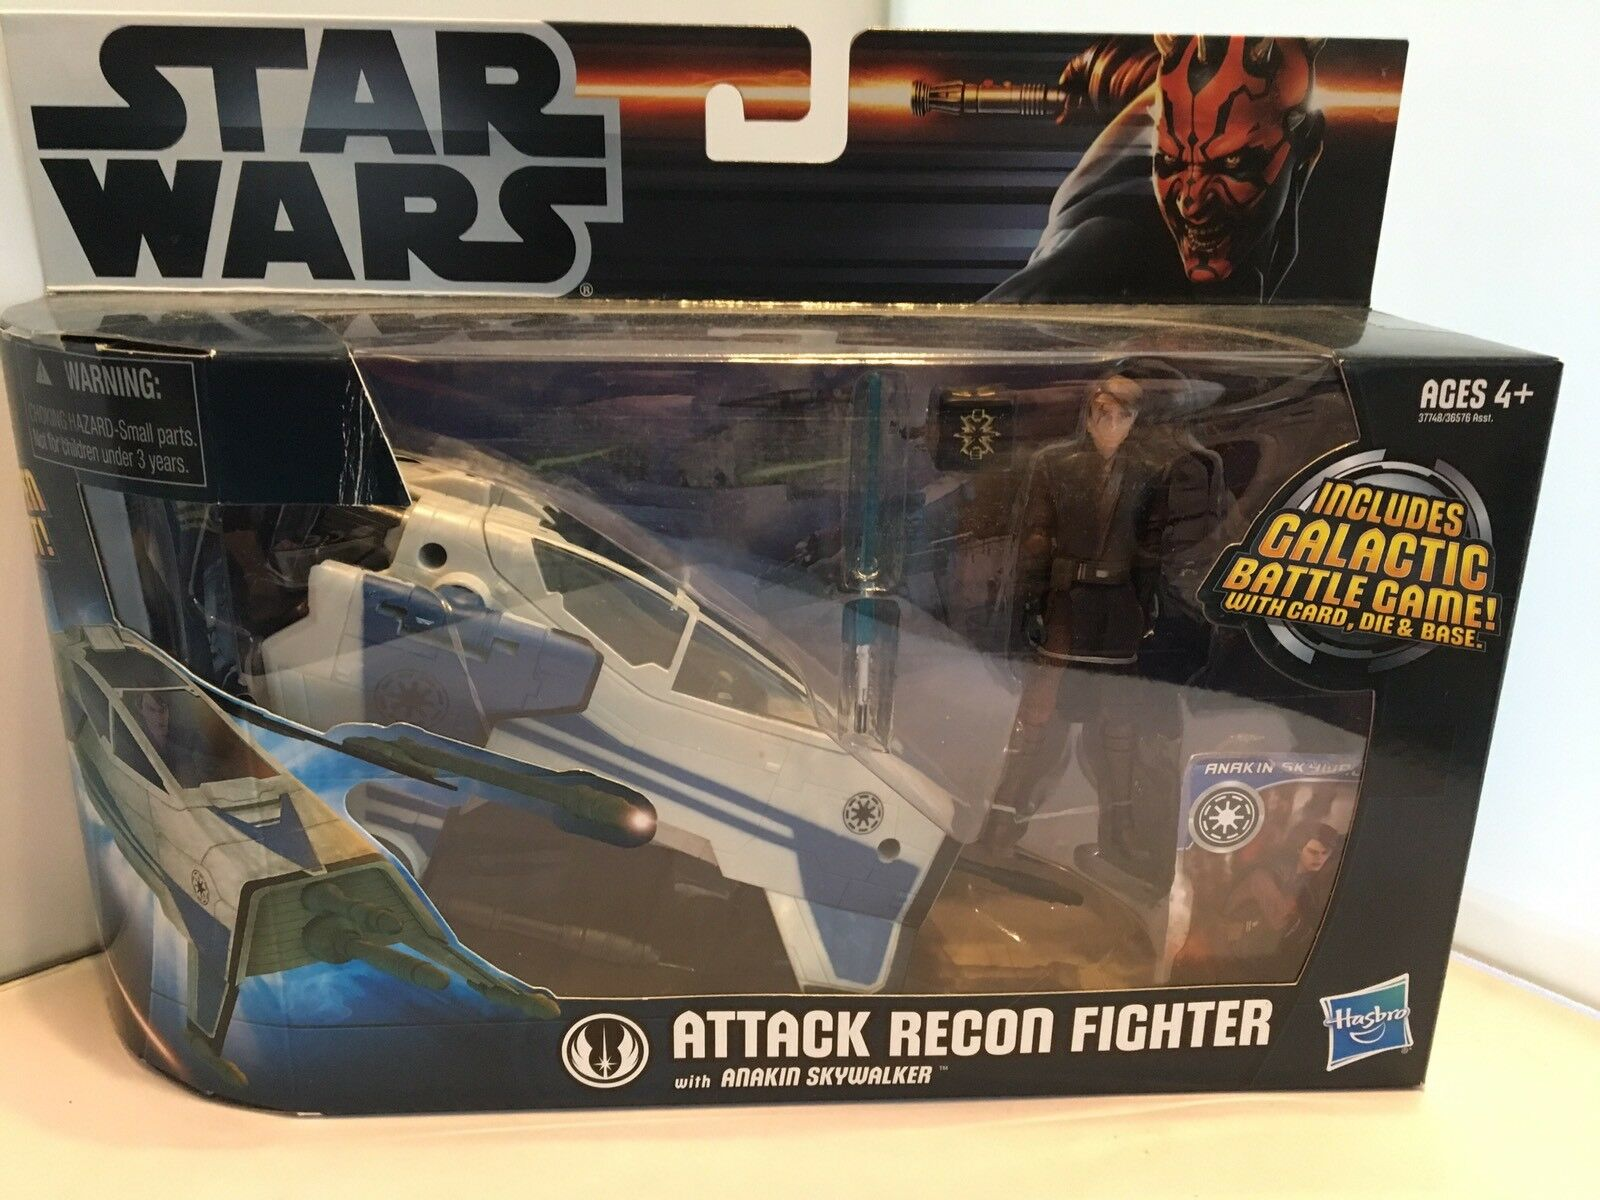 Star Wars Clone Wars - Attack Recon Fighter.